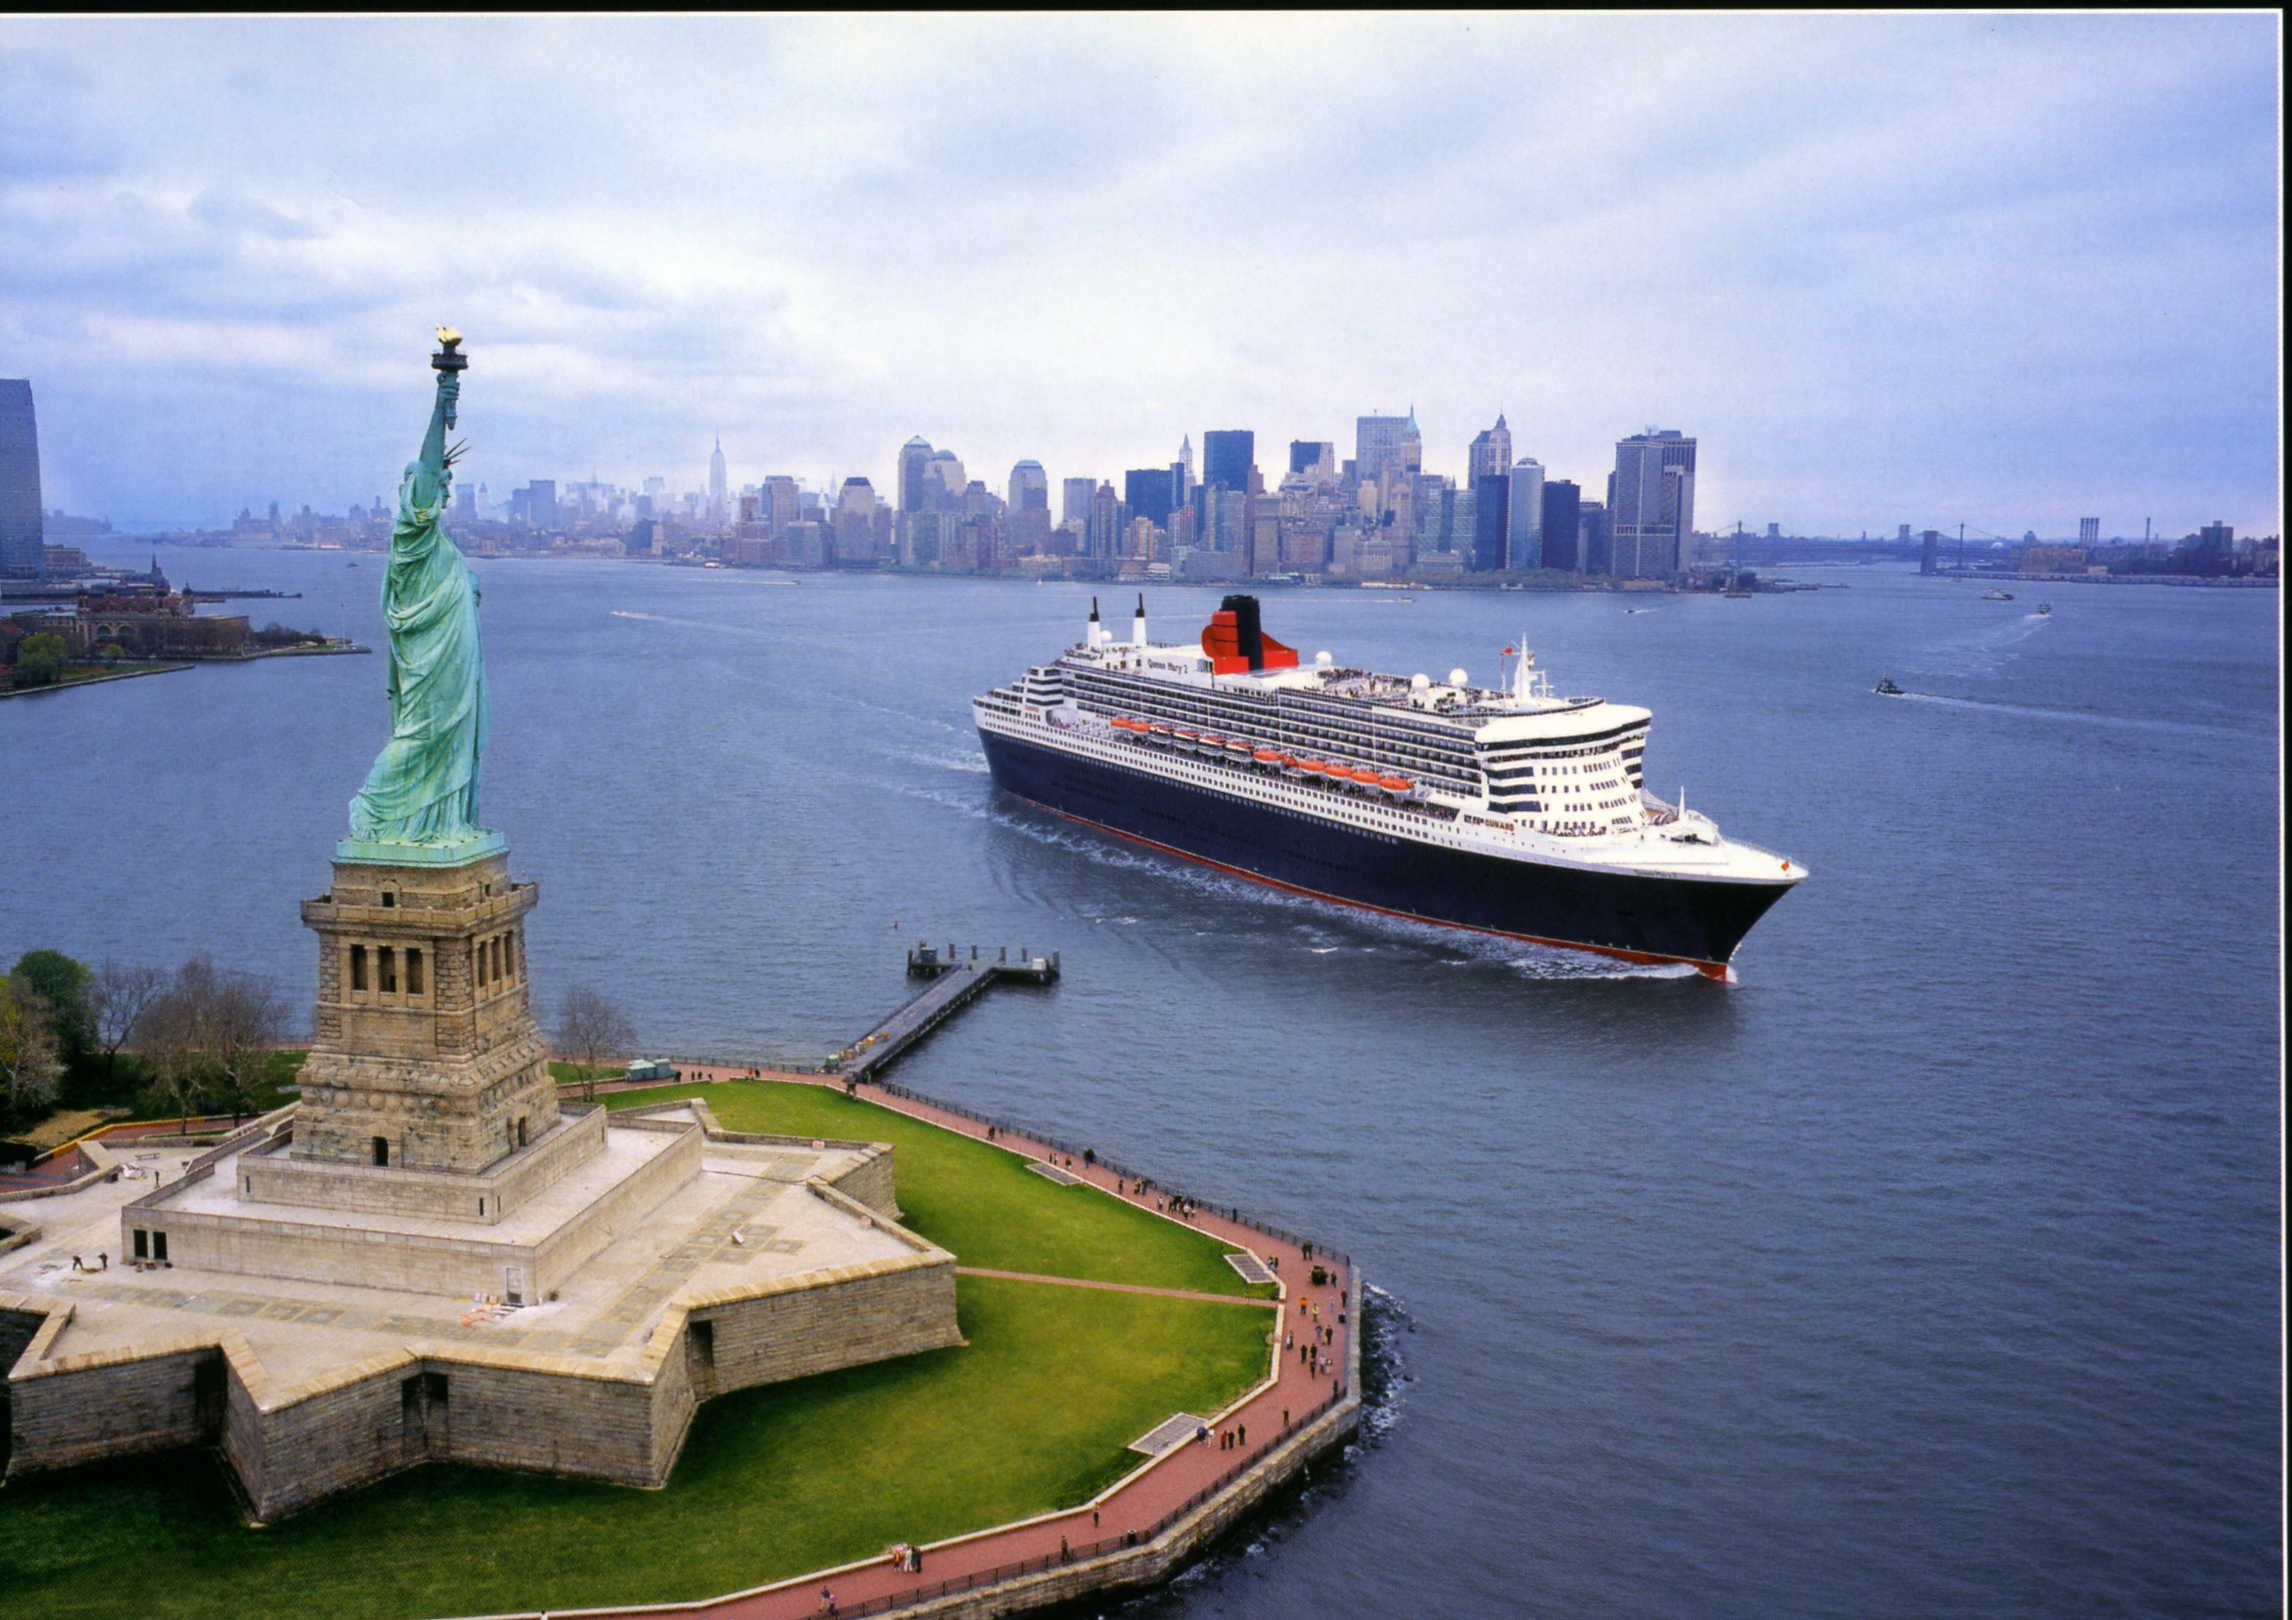 Cunard's Queen Mary 2. Transatlantic crossing for 25th